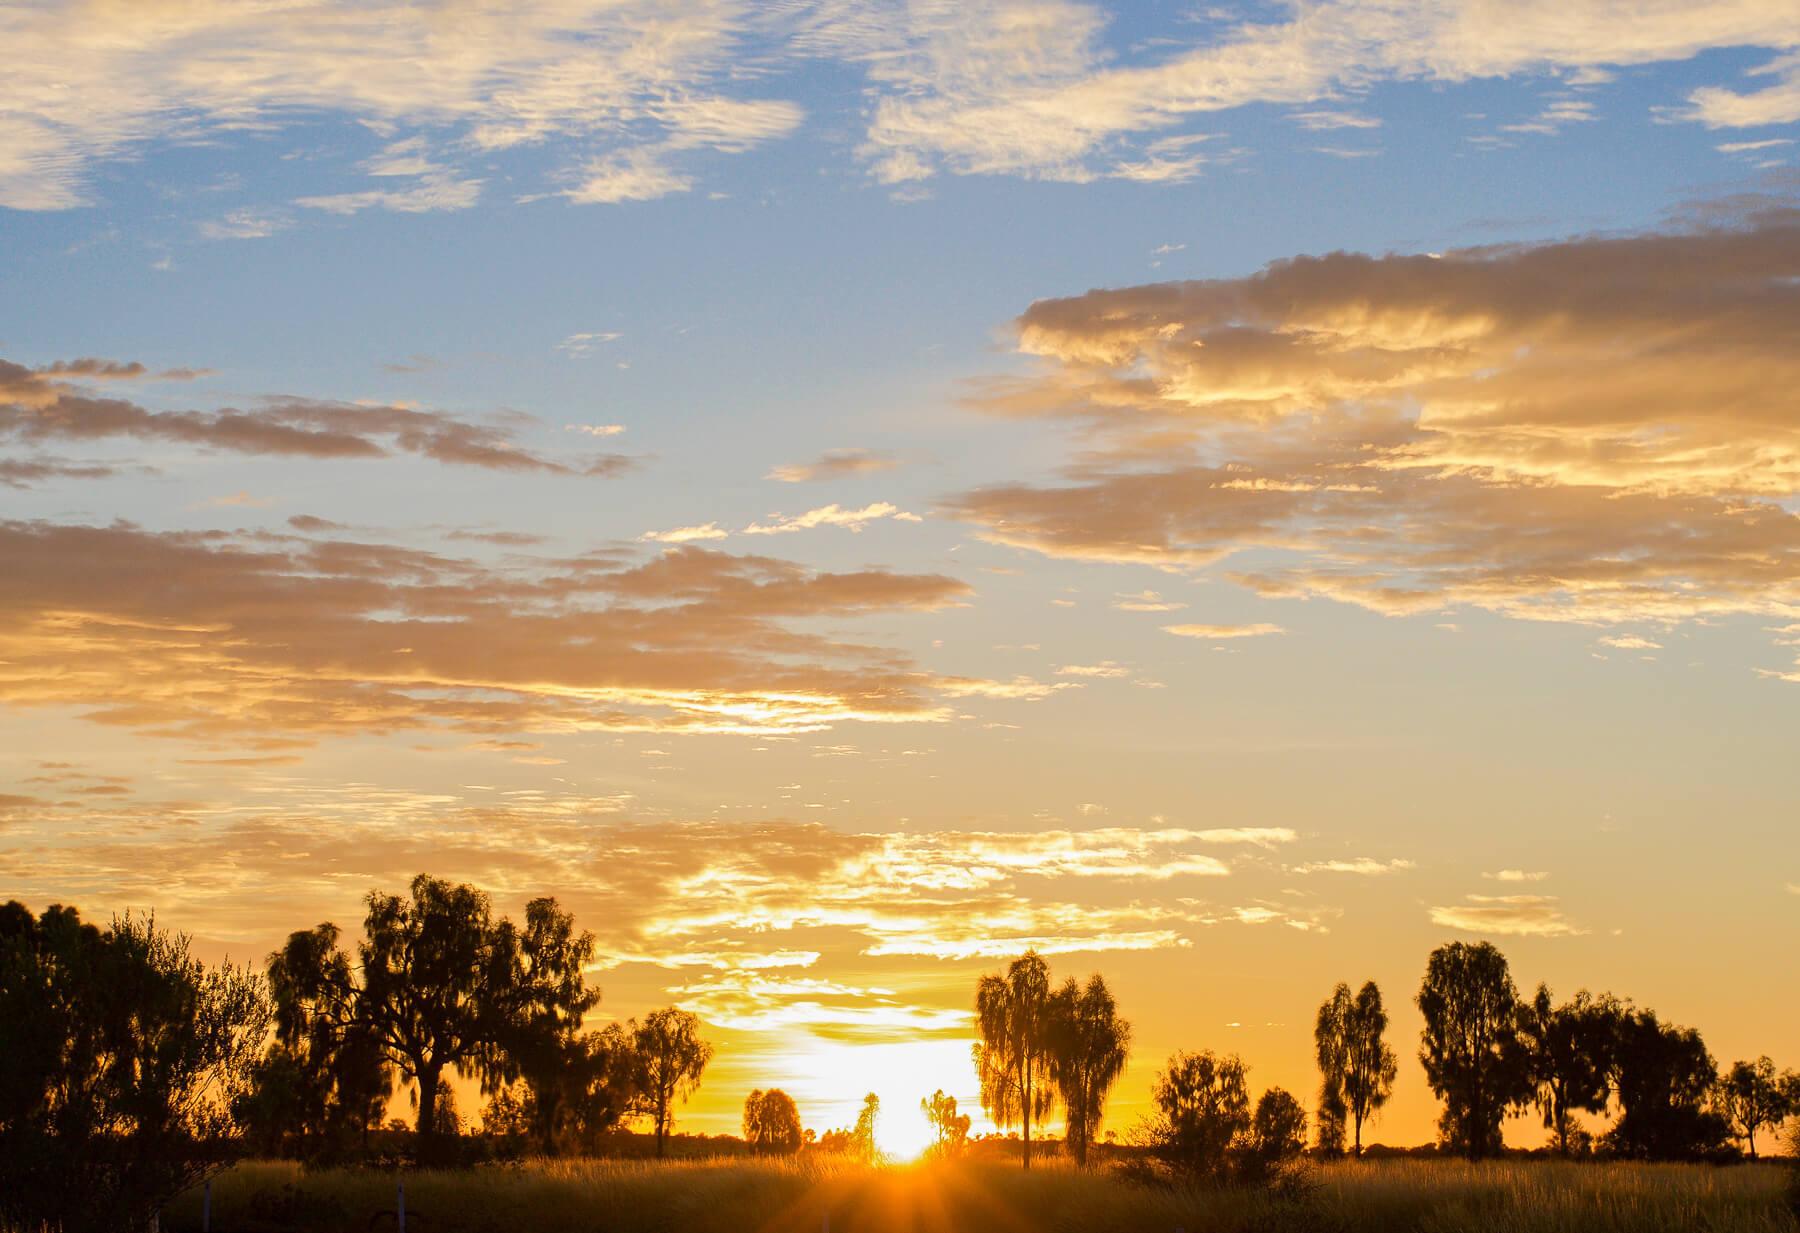 Sun peering over the horizon behind the desert trees